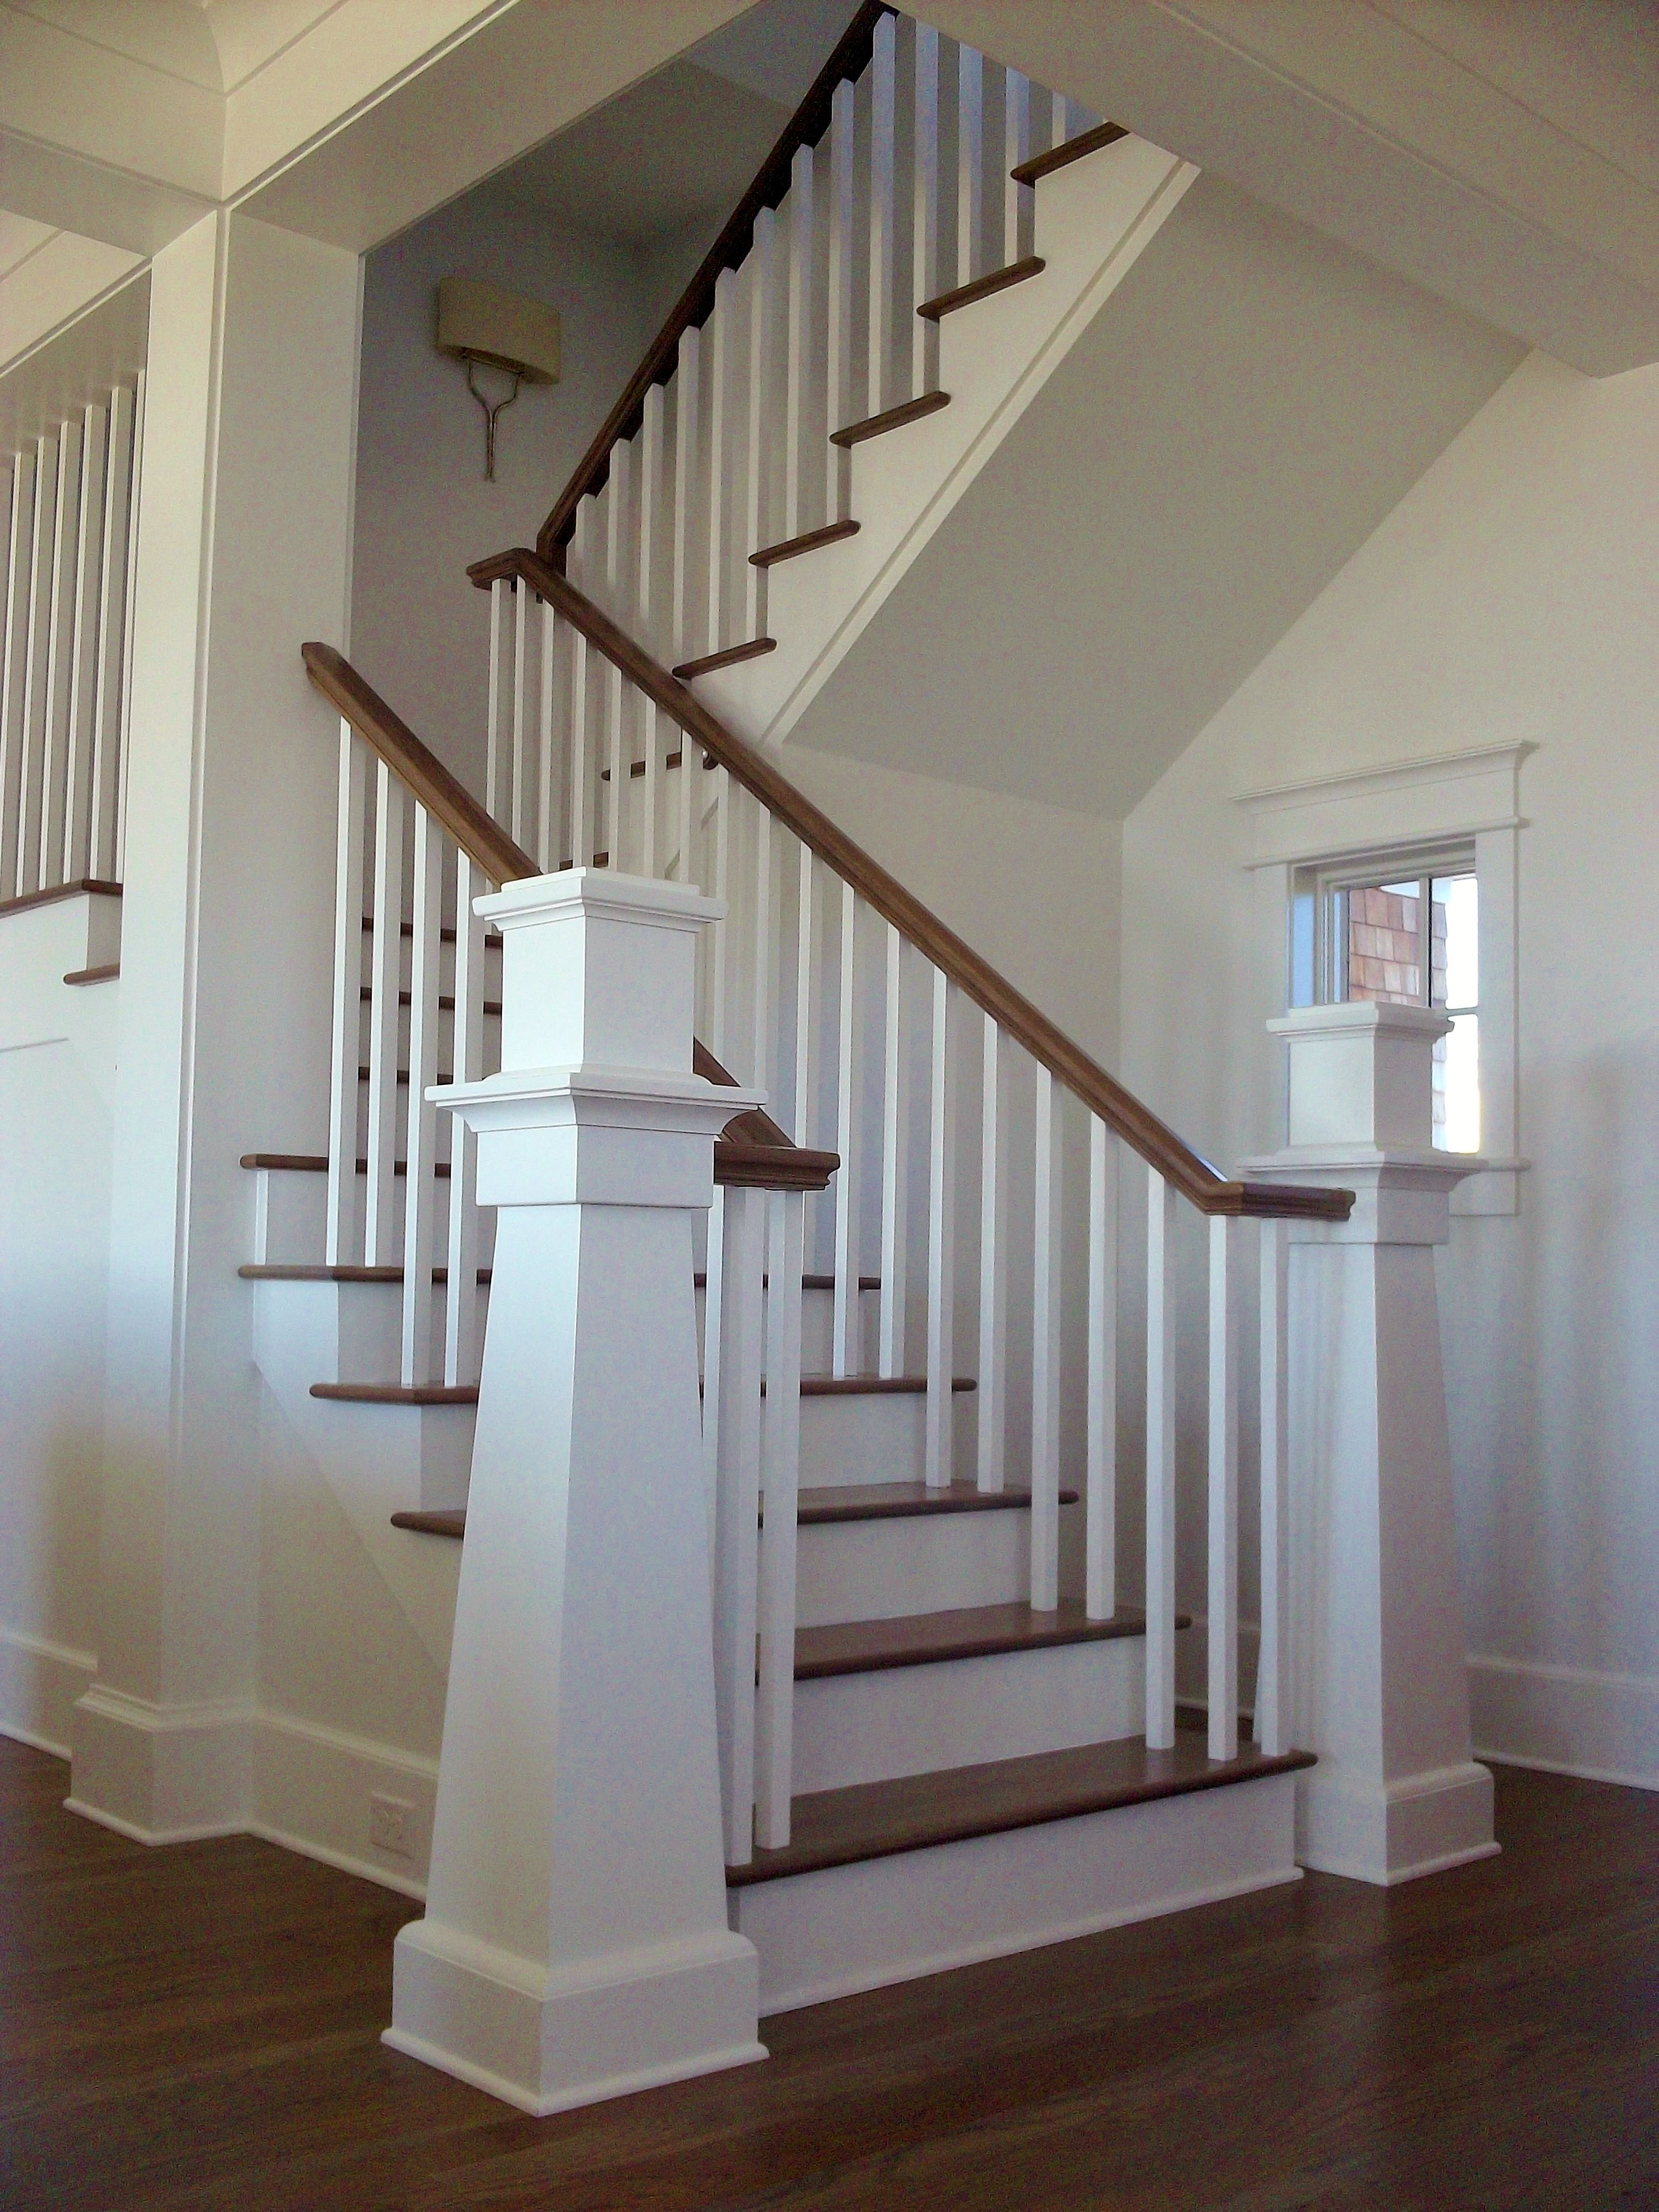 Custom Newel Post Custom Newel Post And Stairs Interior Trim Projects Pinterest